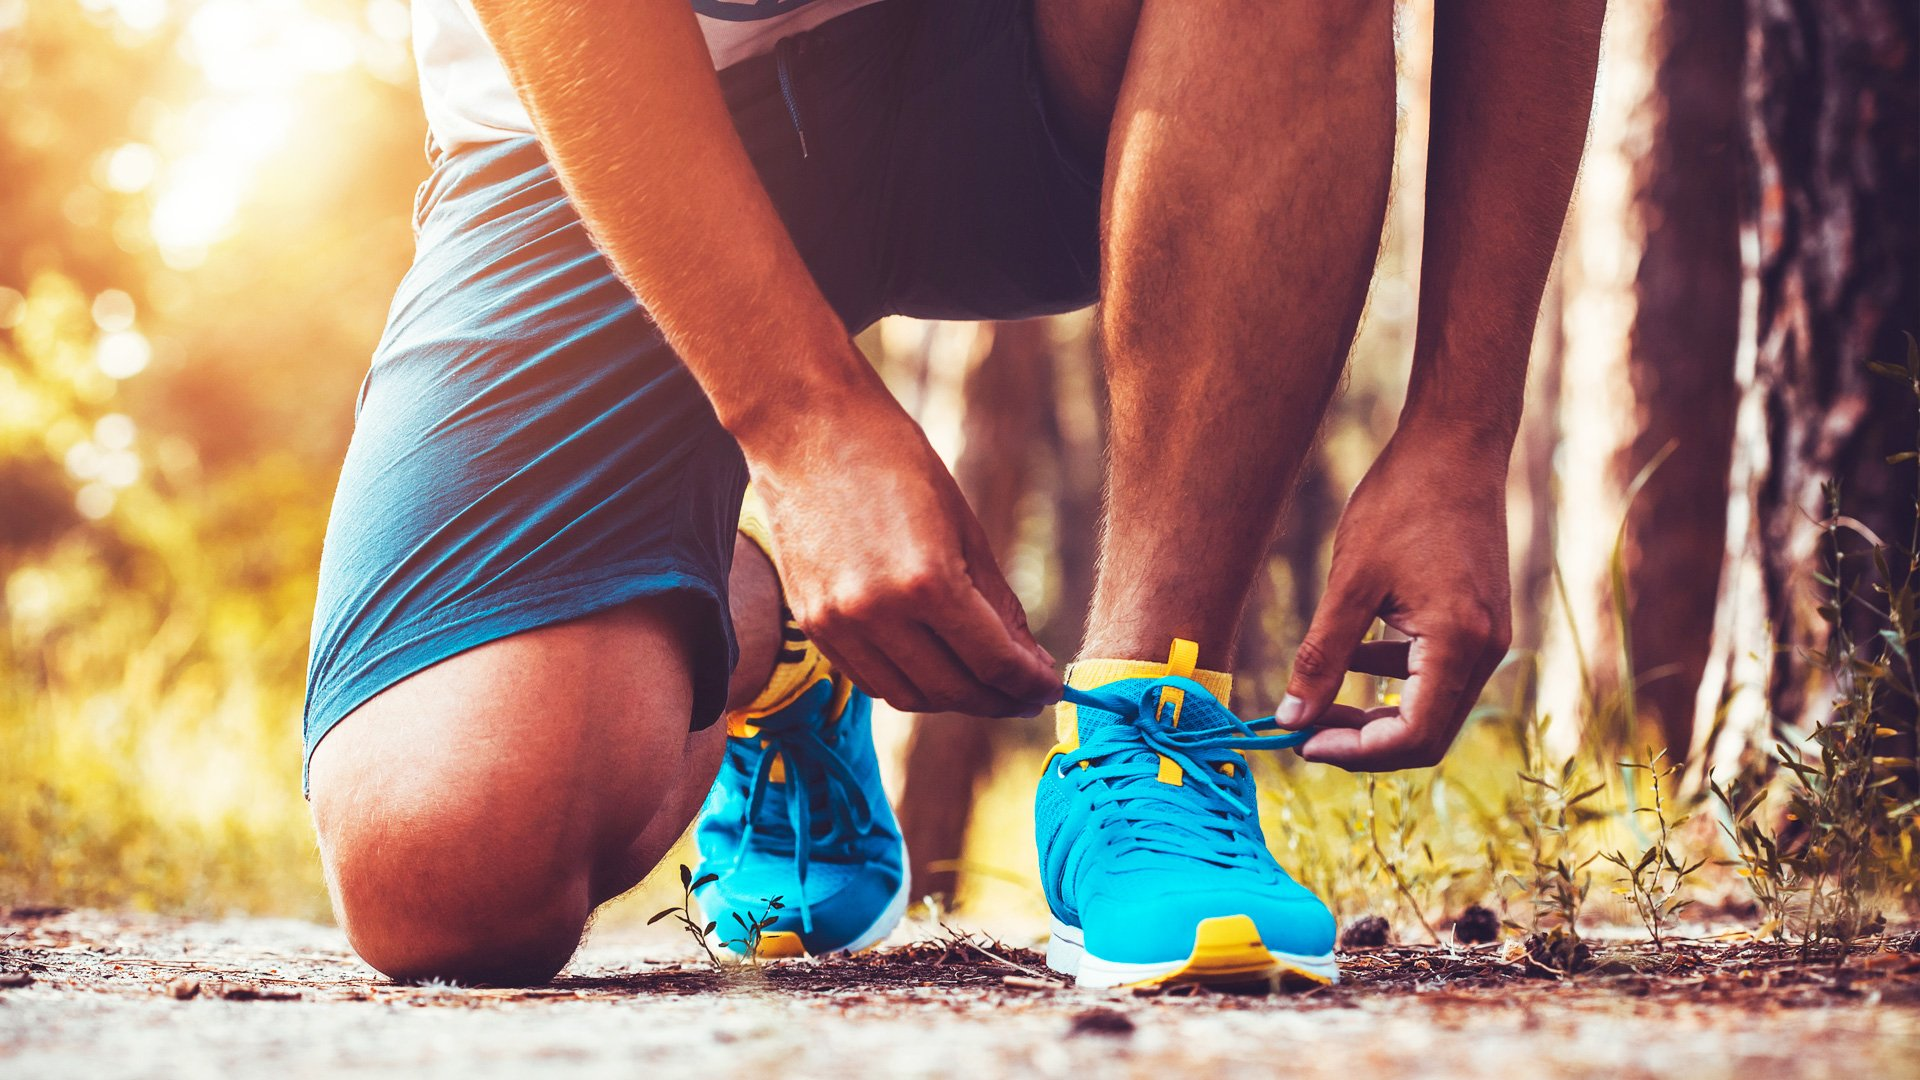 Zglobex sprej - za sportske povrede